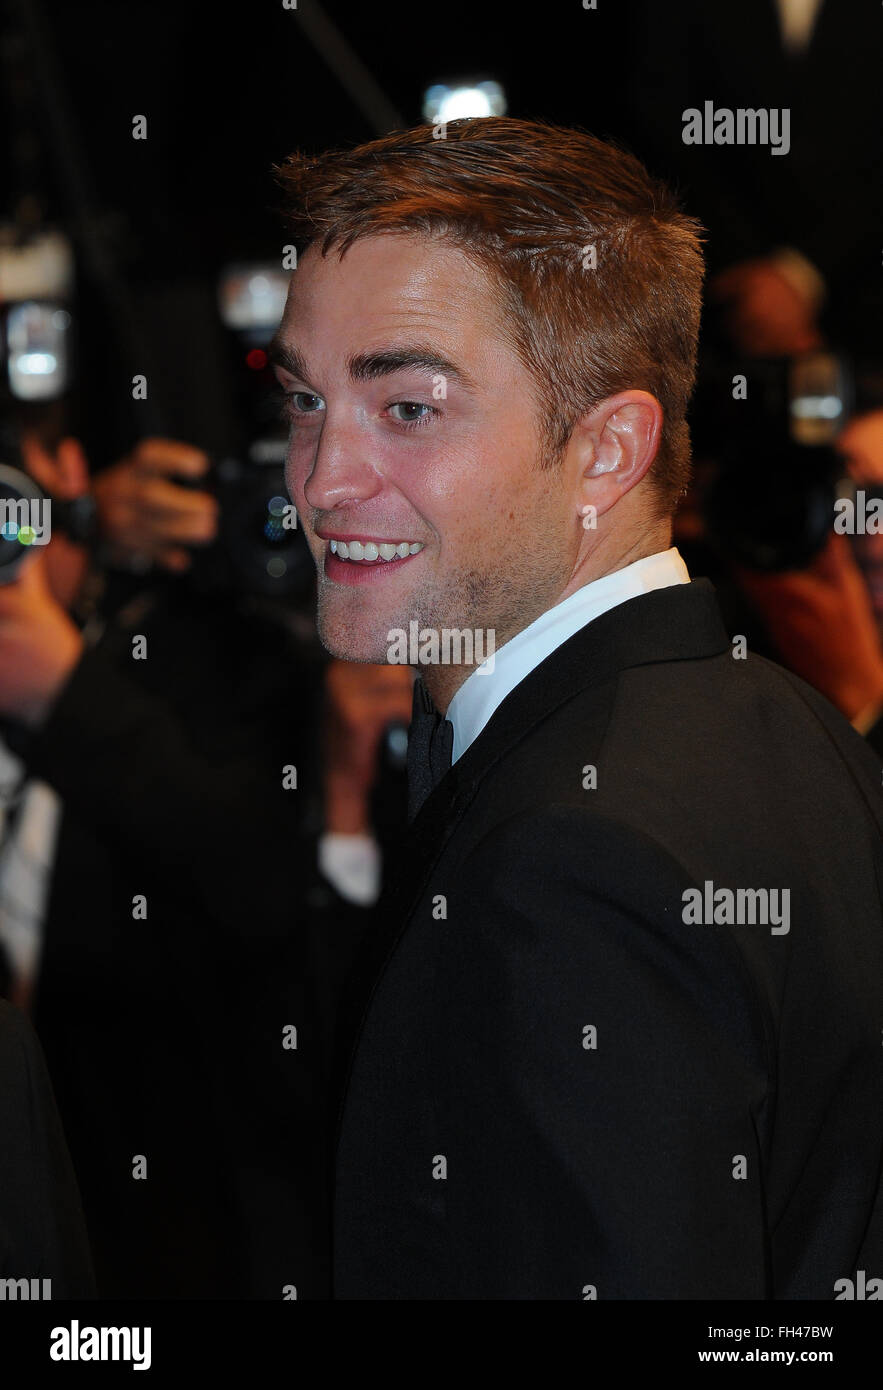 Cannes Film Festival - Stock Image